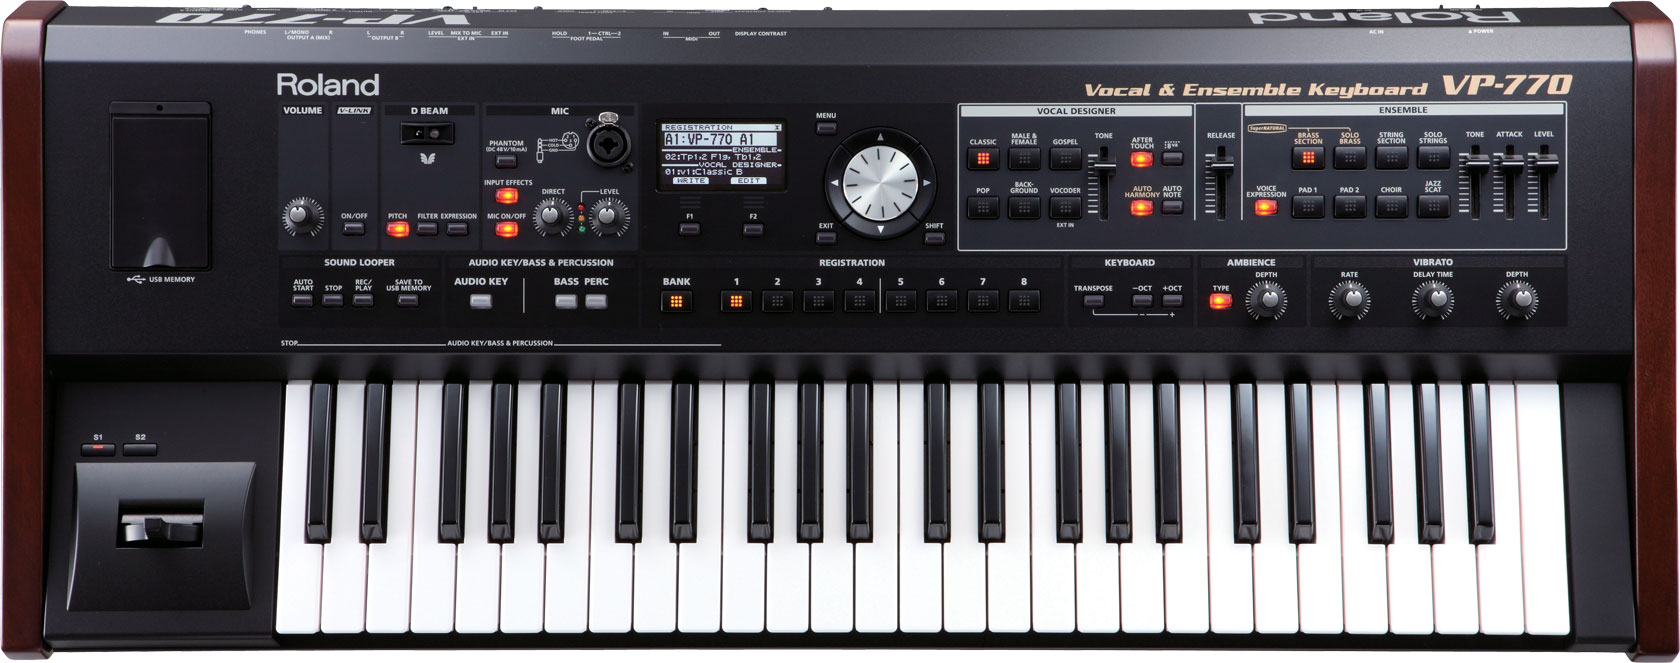 Roland - VP-770 | Vocal & Ensemble Keyboard